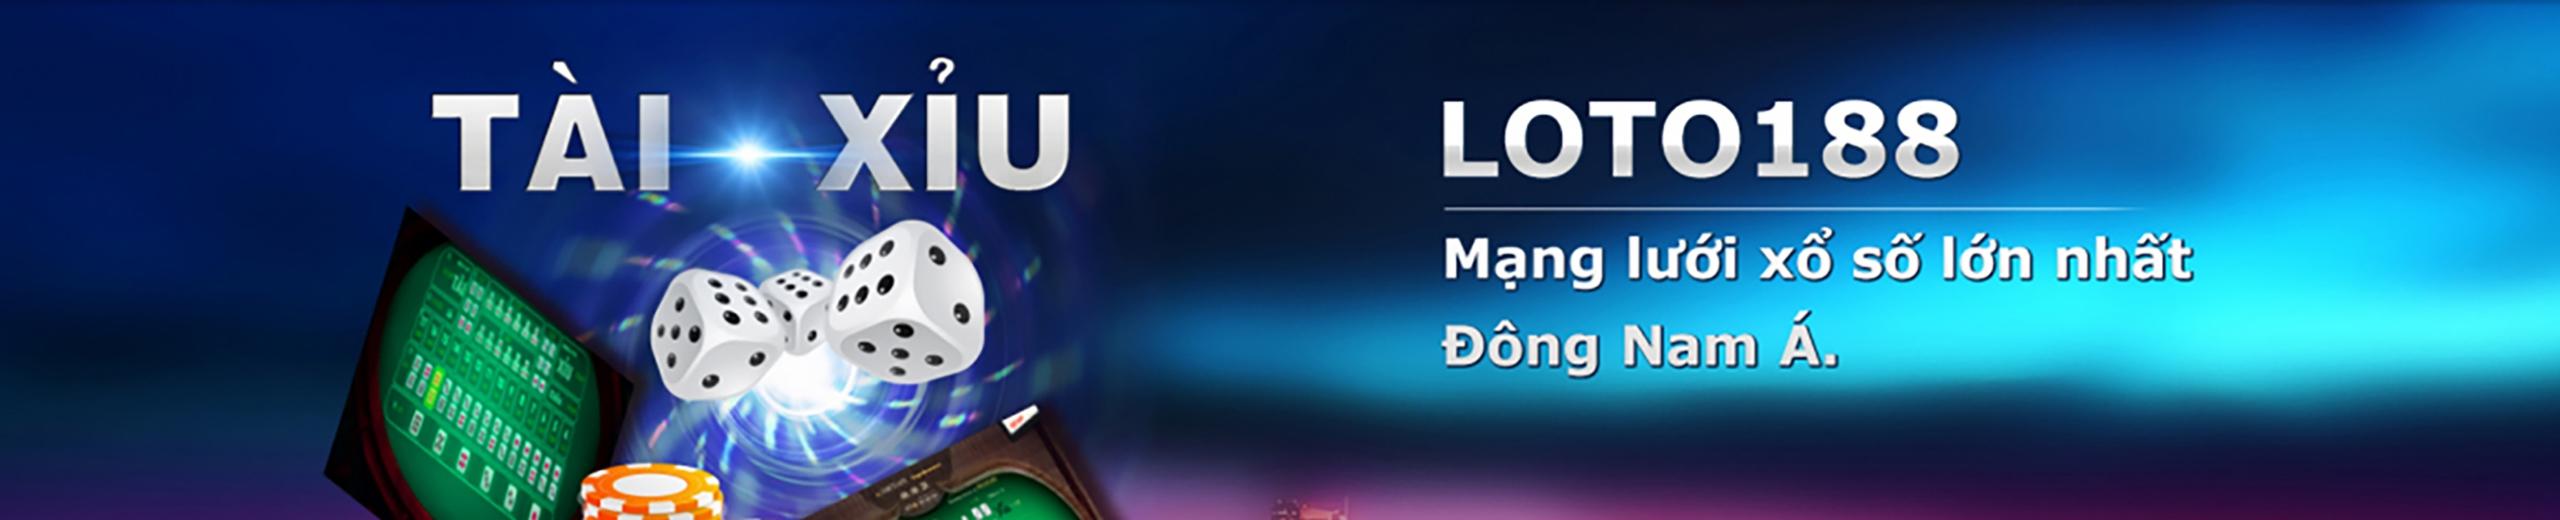 loto188co (@loto188co) Cover Image